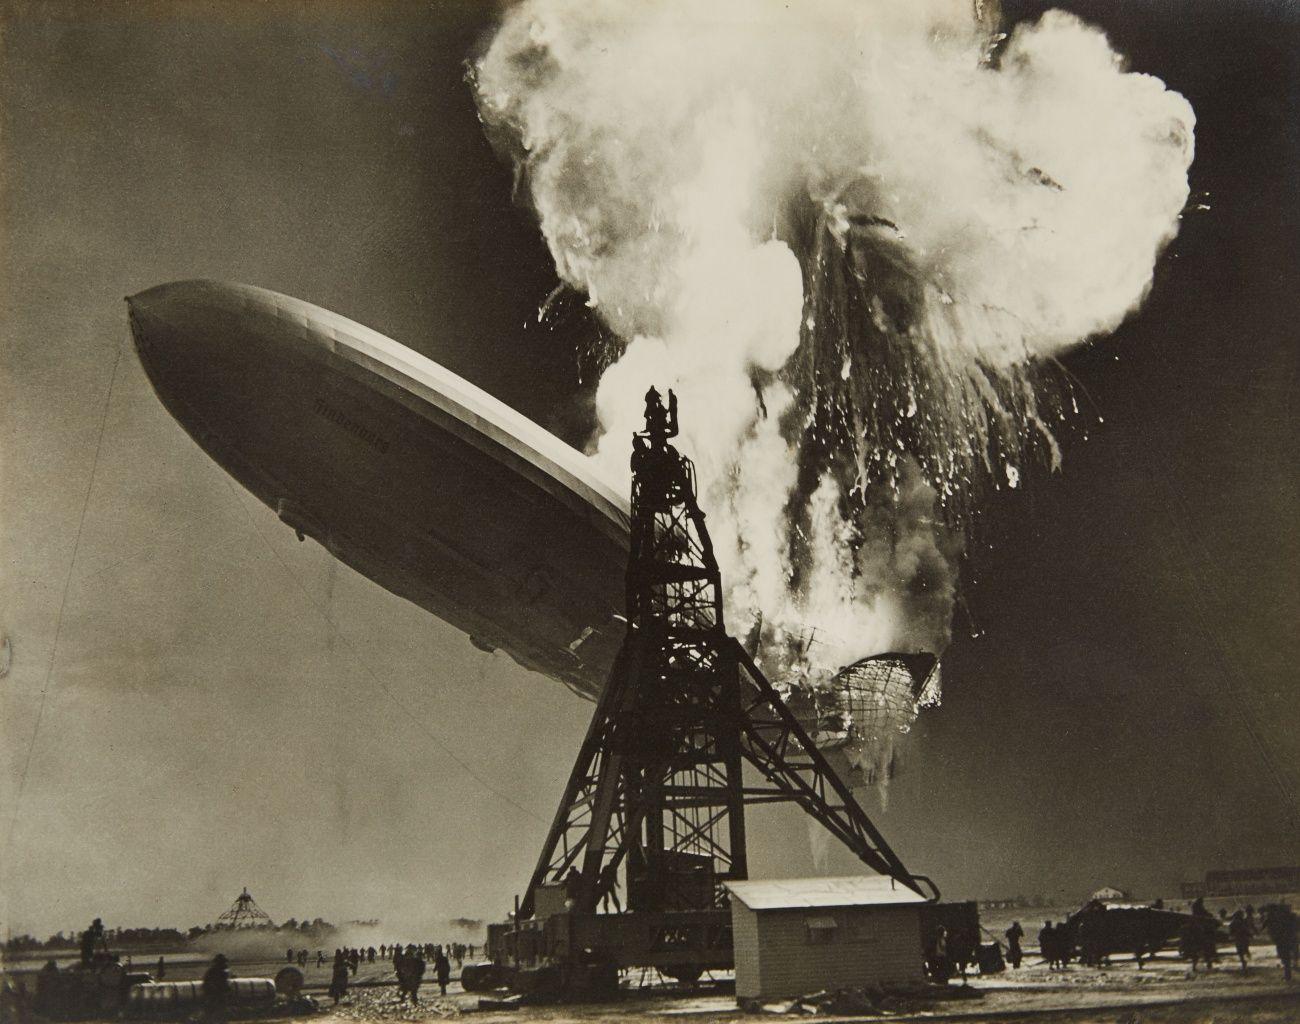 Charles Hoff, Explosion of the Hindenburg, Lakehurst New Jersey, May 6, 1937